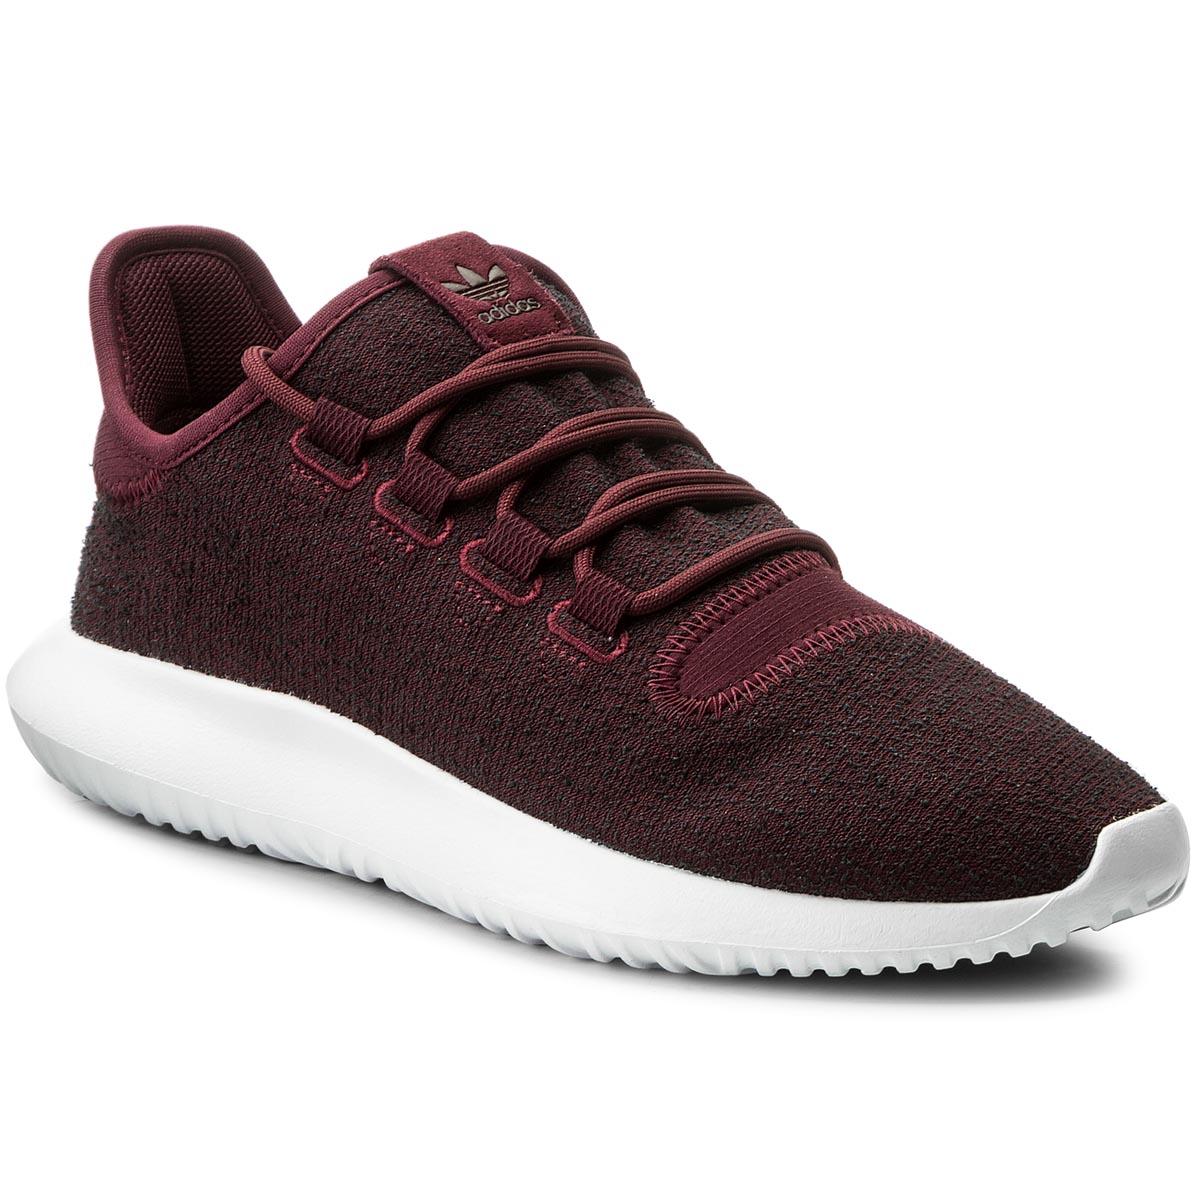 37d581de84dba Shoes adidas - Swift Run C B41844 Olicar Olicar Carbon - Laced shoes ...